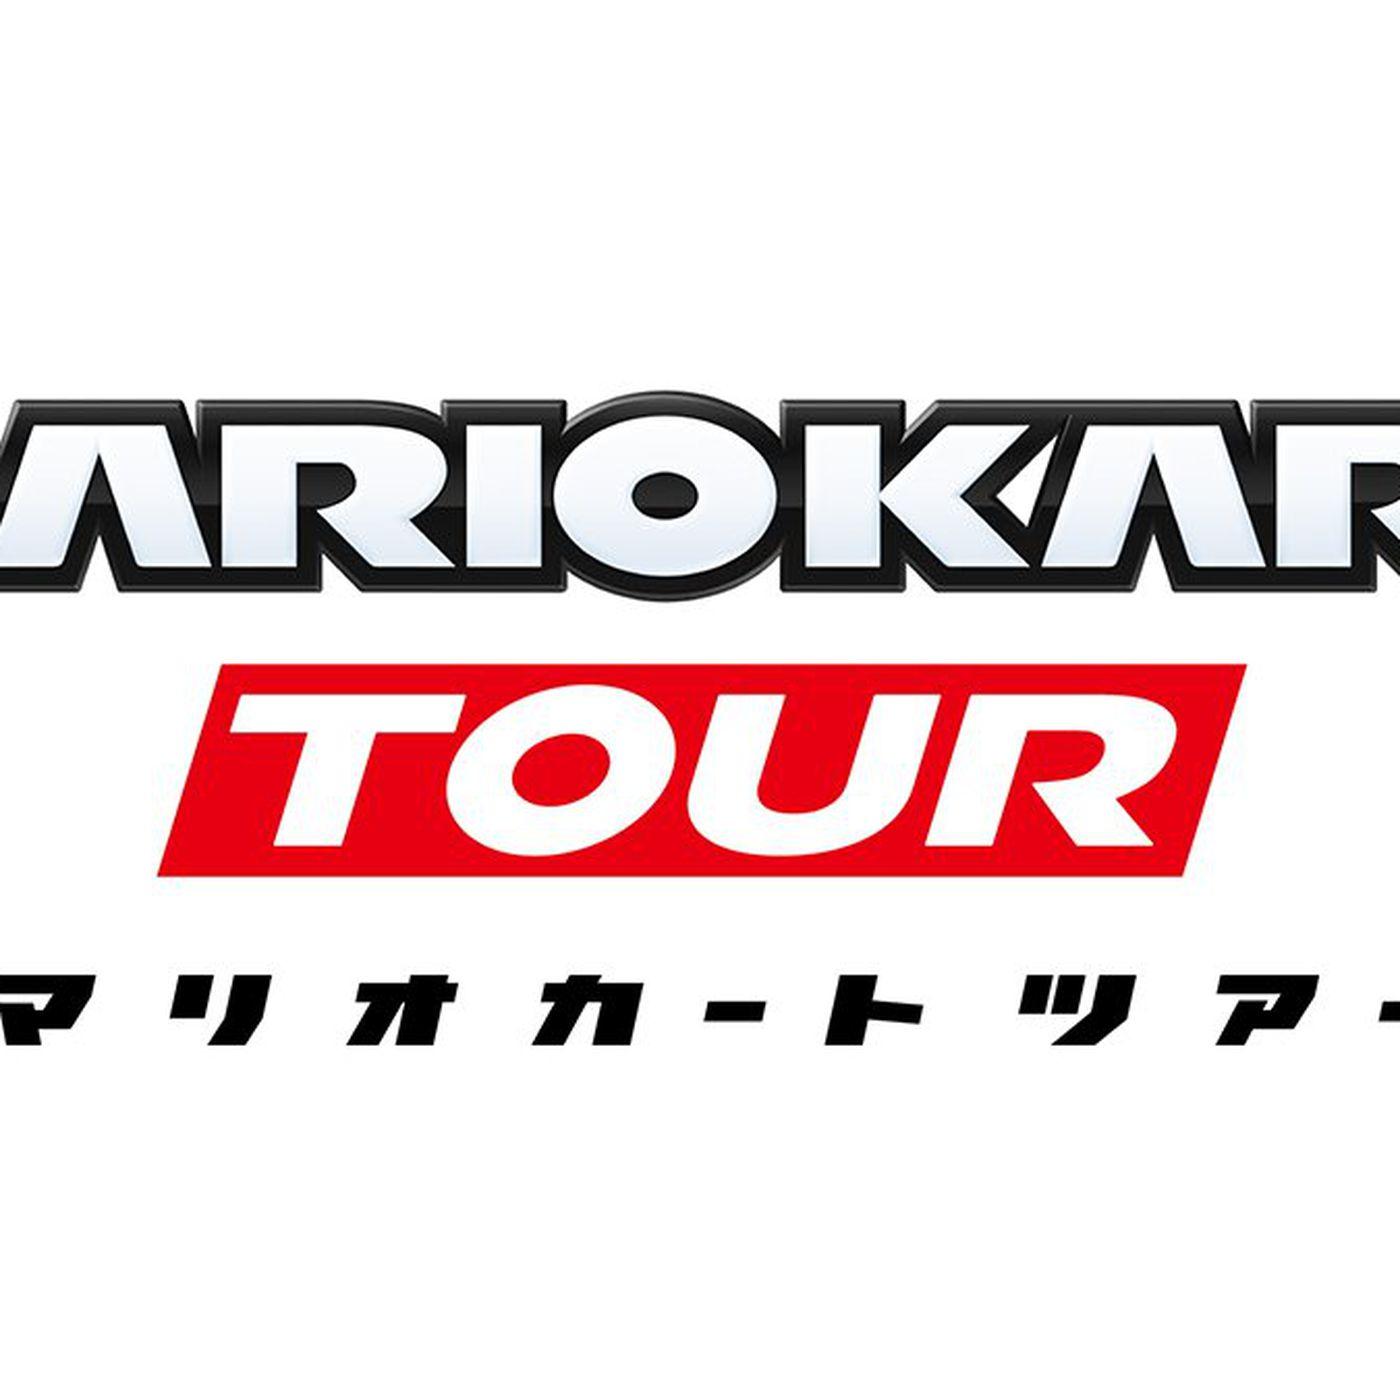 Nintendo Opens Beta Signups For Mario Kart Tour The Verge